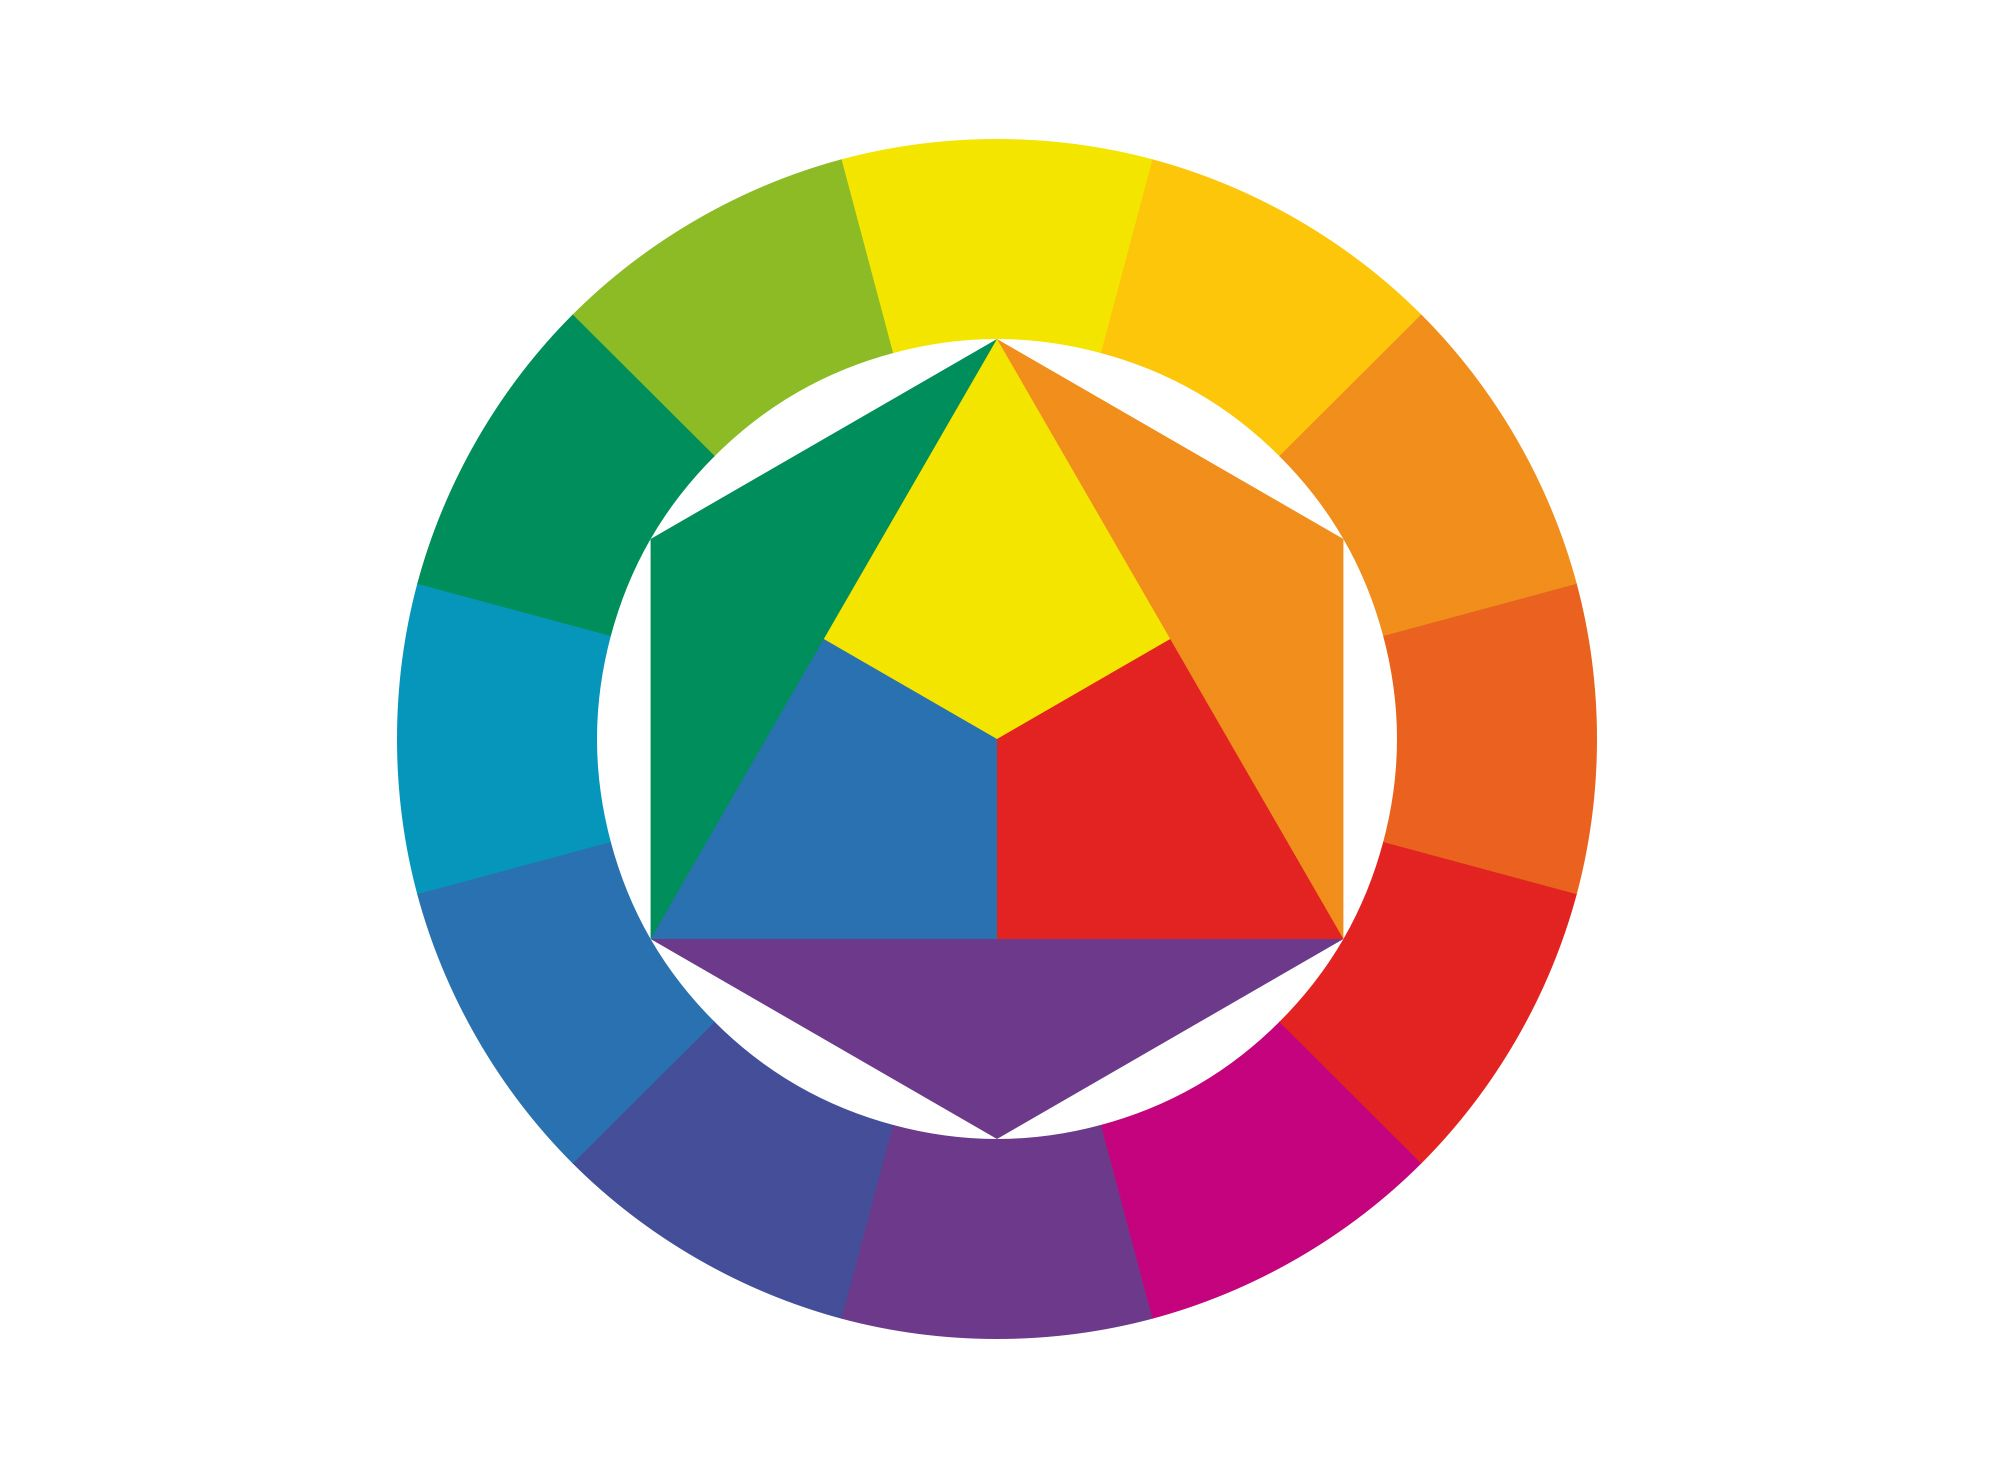 Passende Farbkombinationen Tipps Wie Man Farben Perfekt